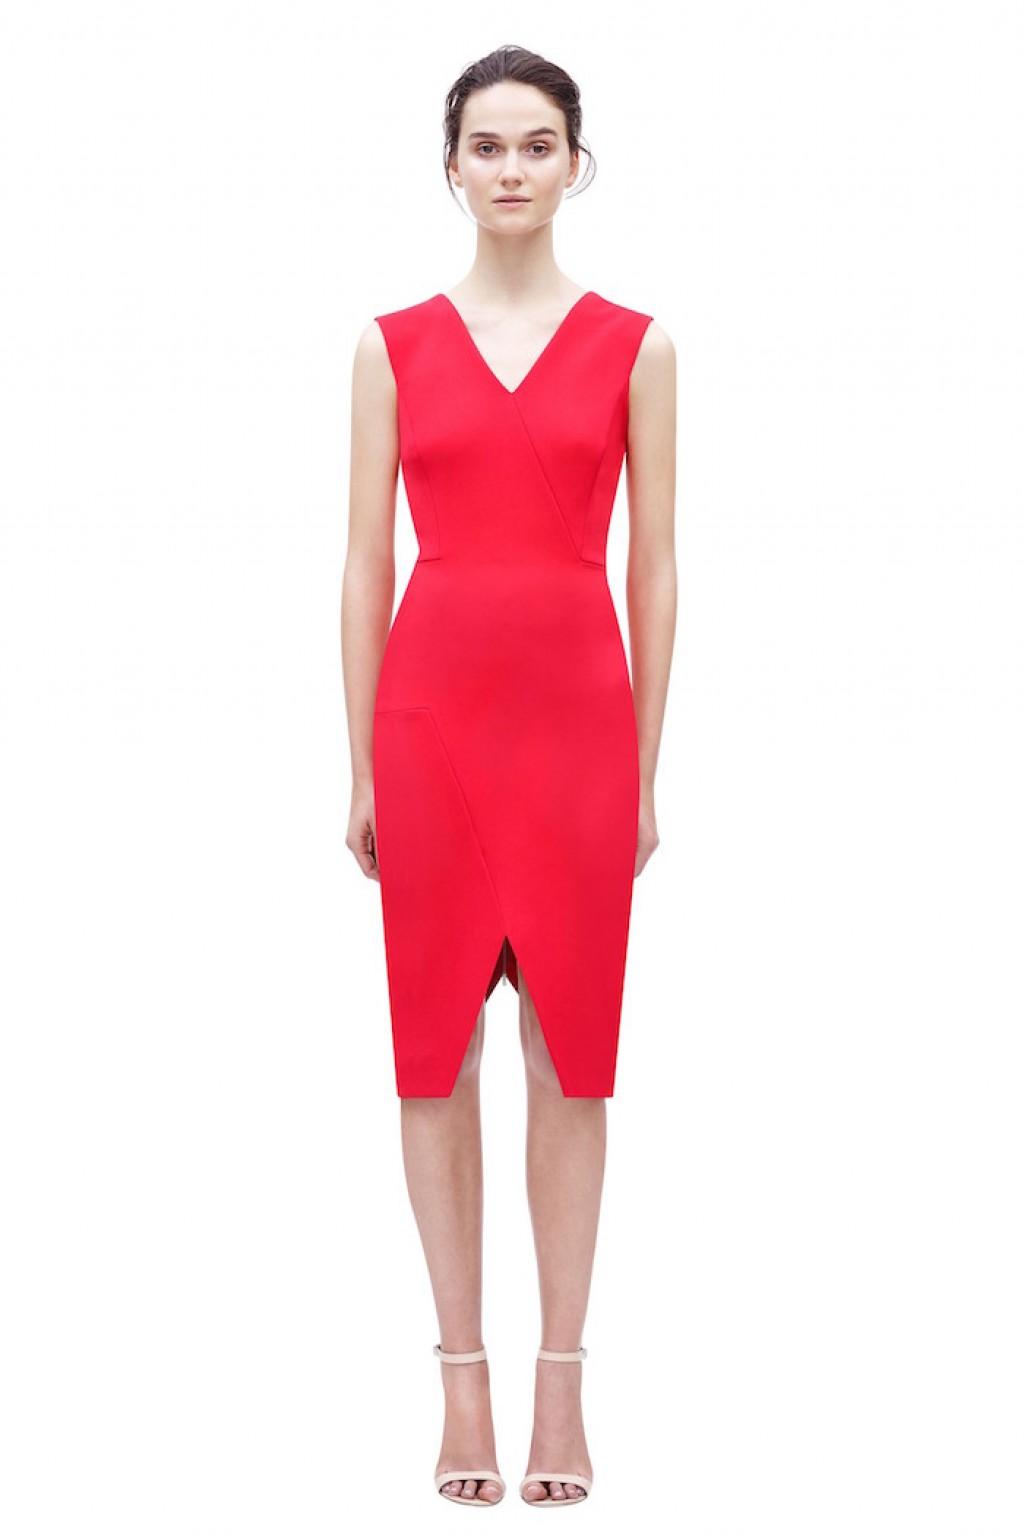 victoria-beckham-eva-longoria-dress-1024x1537